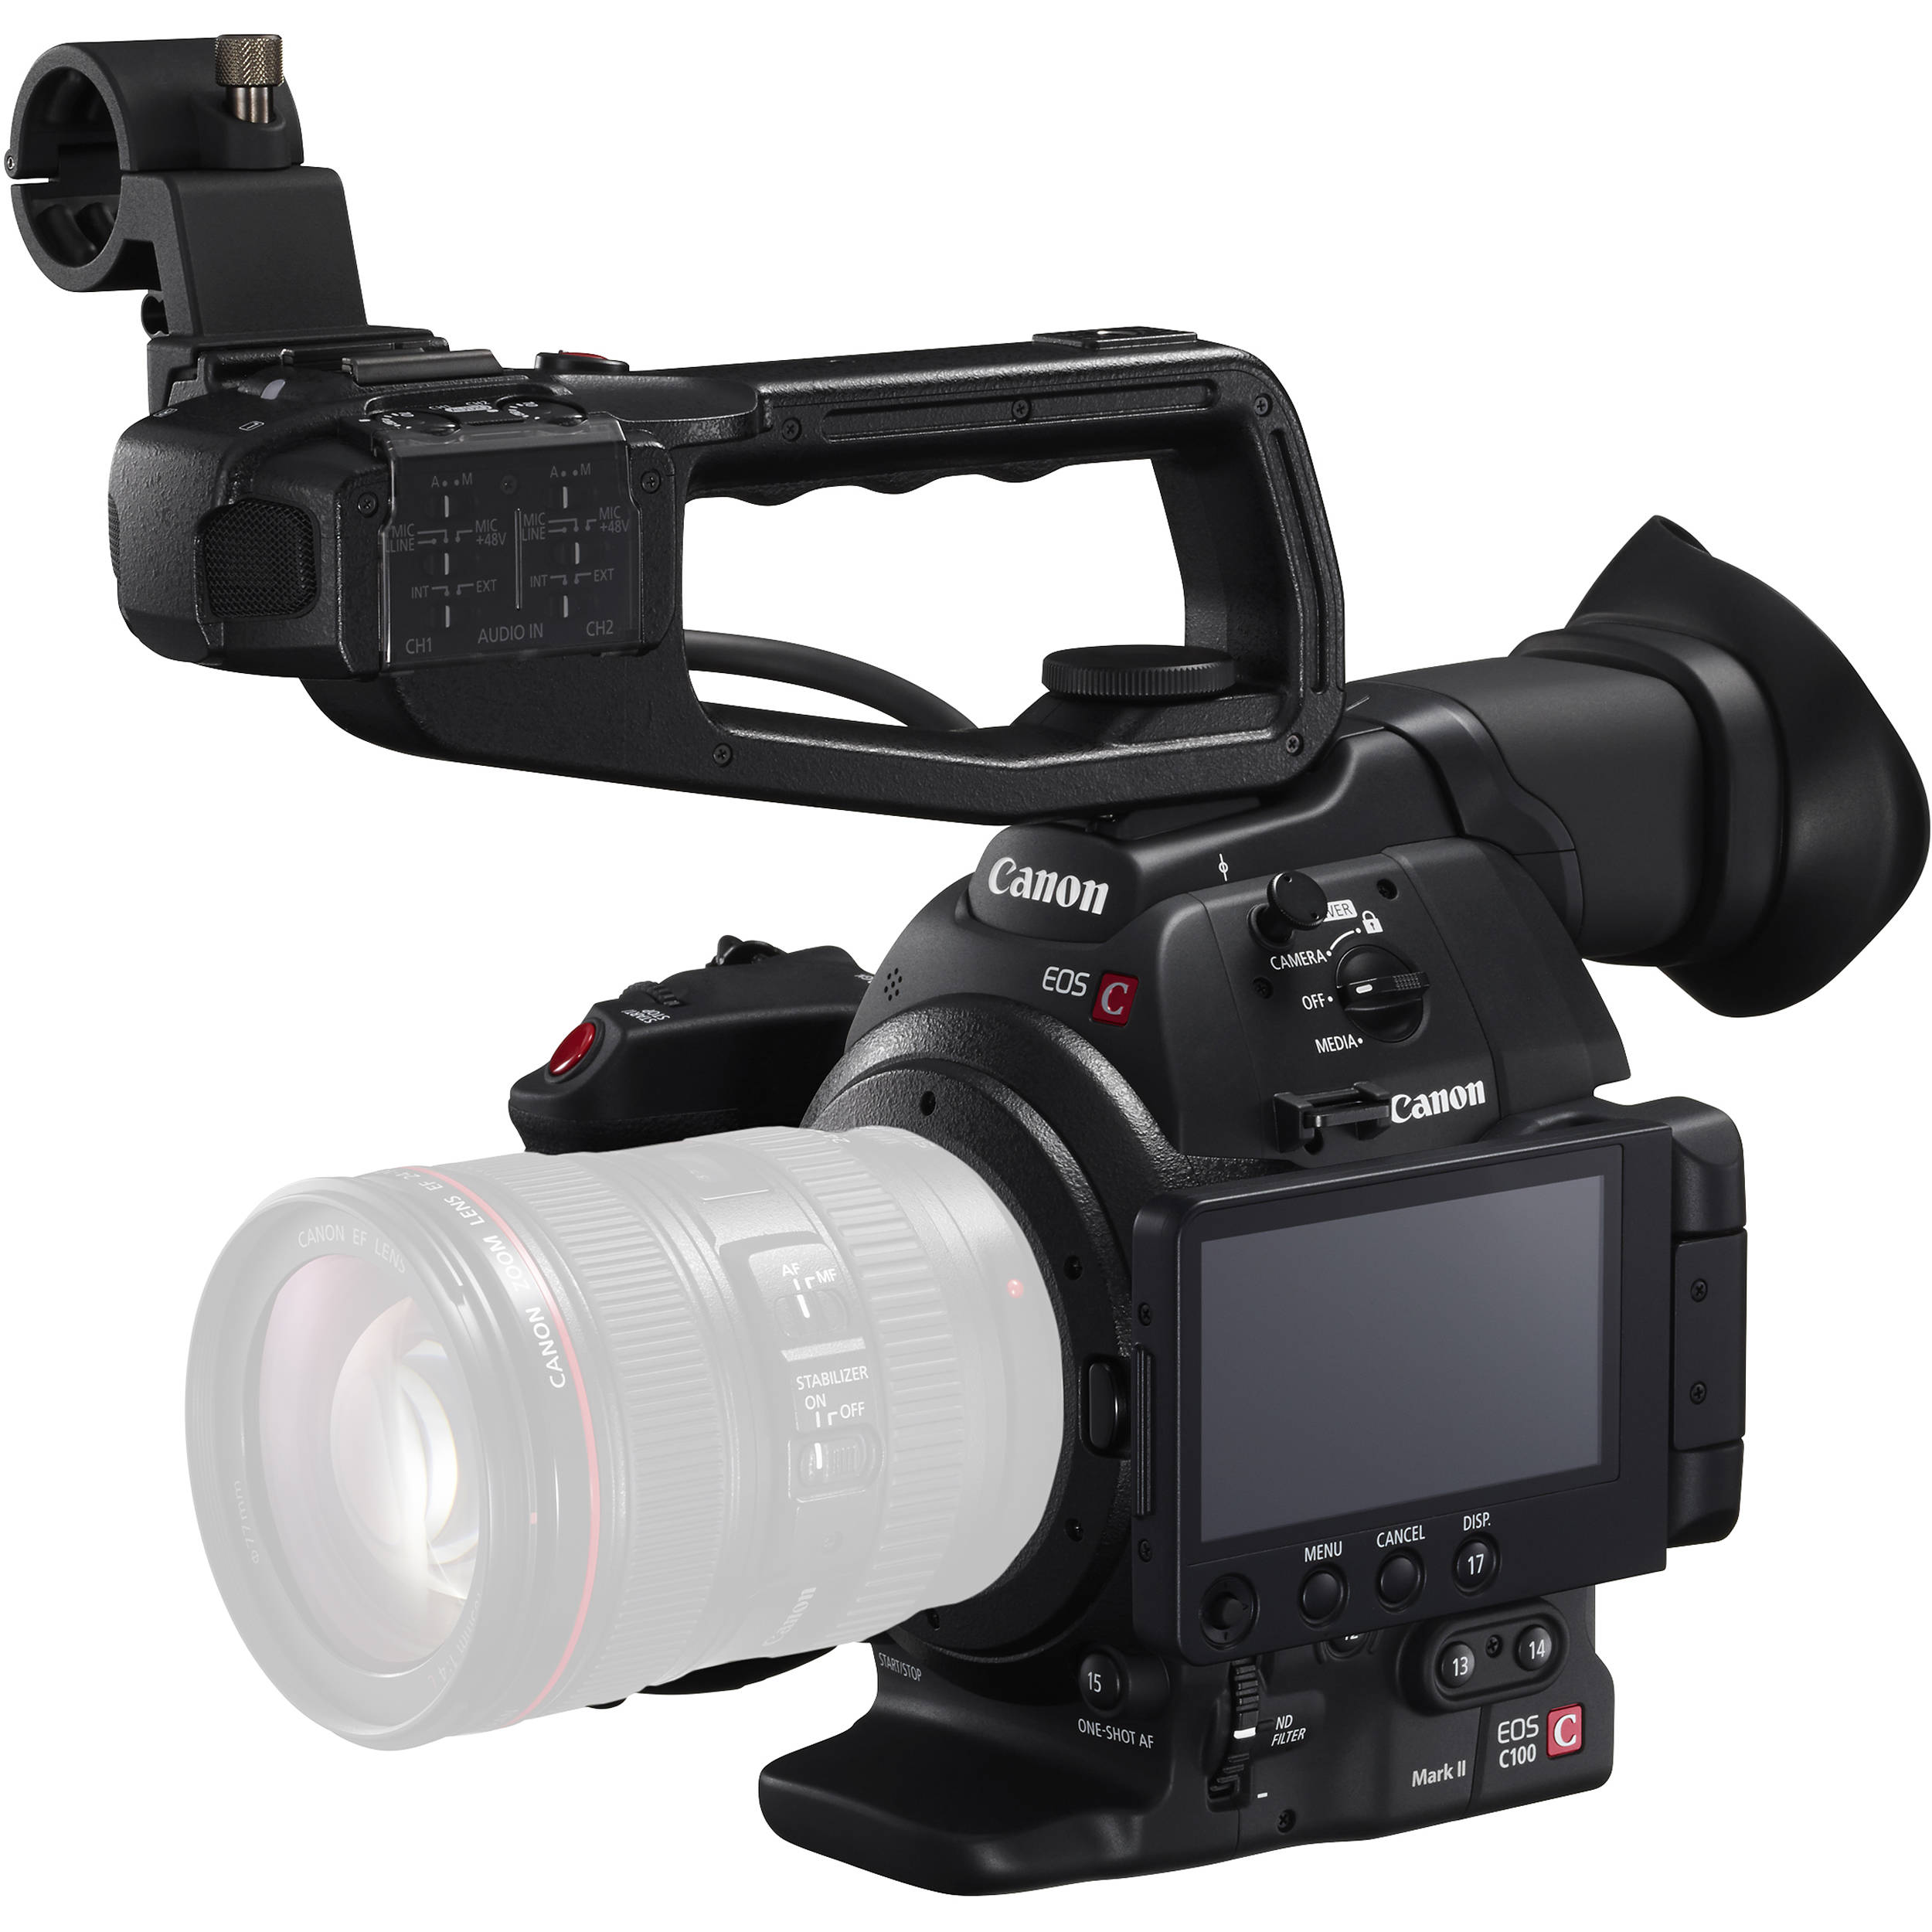 Canon C100 Mark Ii Cinema Eos Camera With Dual Pixel Cmos Af Flashdisk V Gen Astro 64 Gb 20 Original Body Only